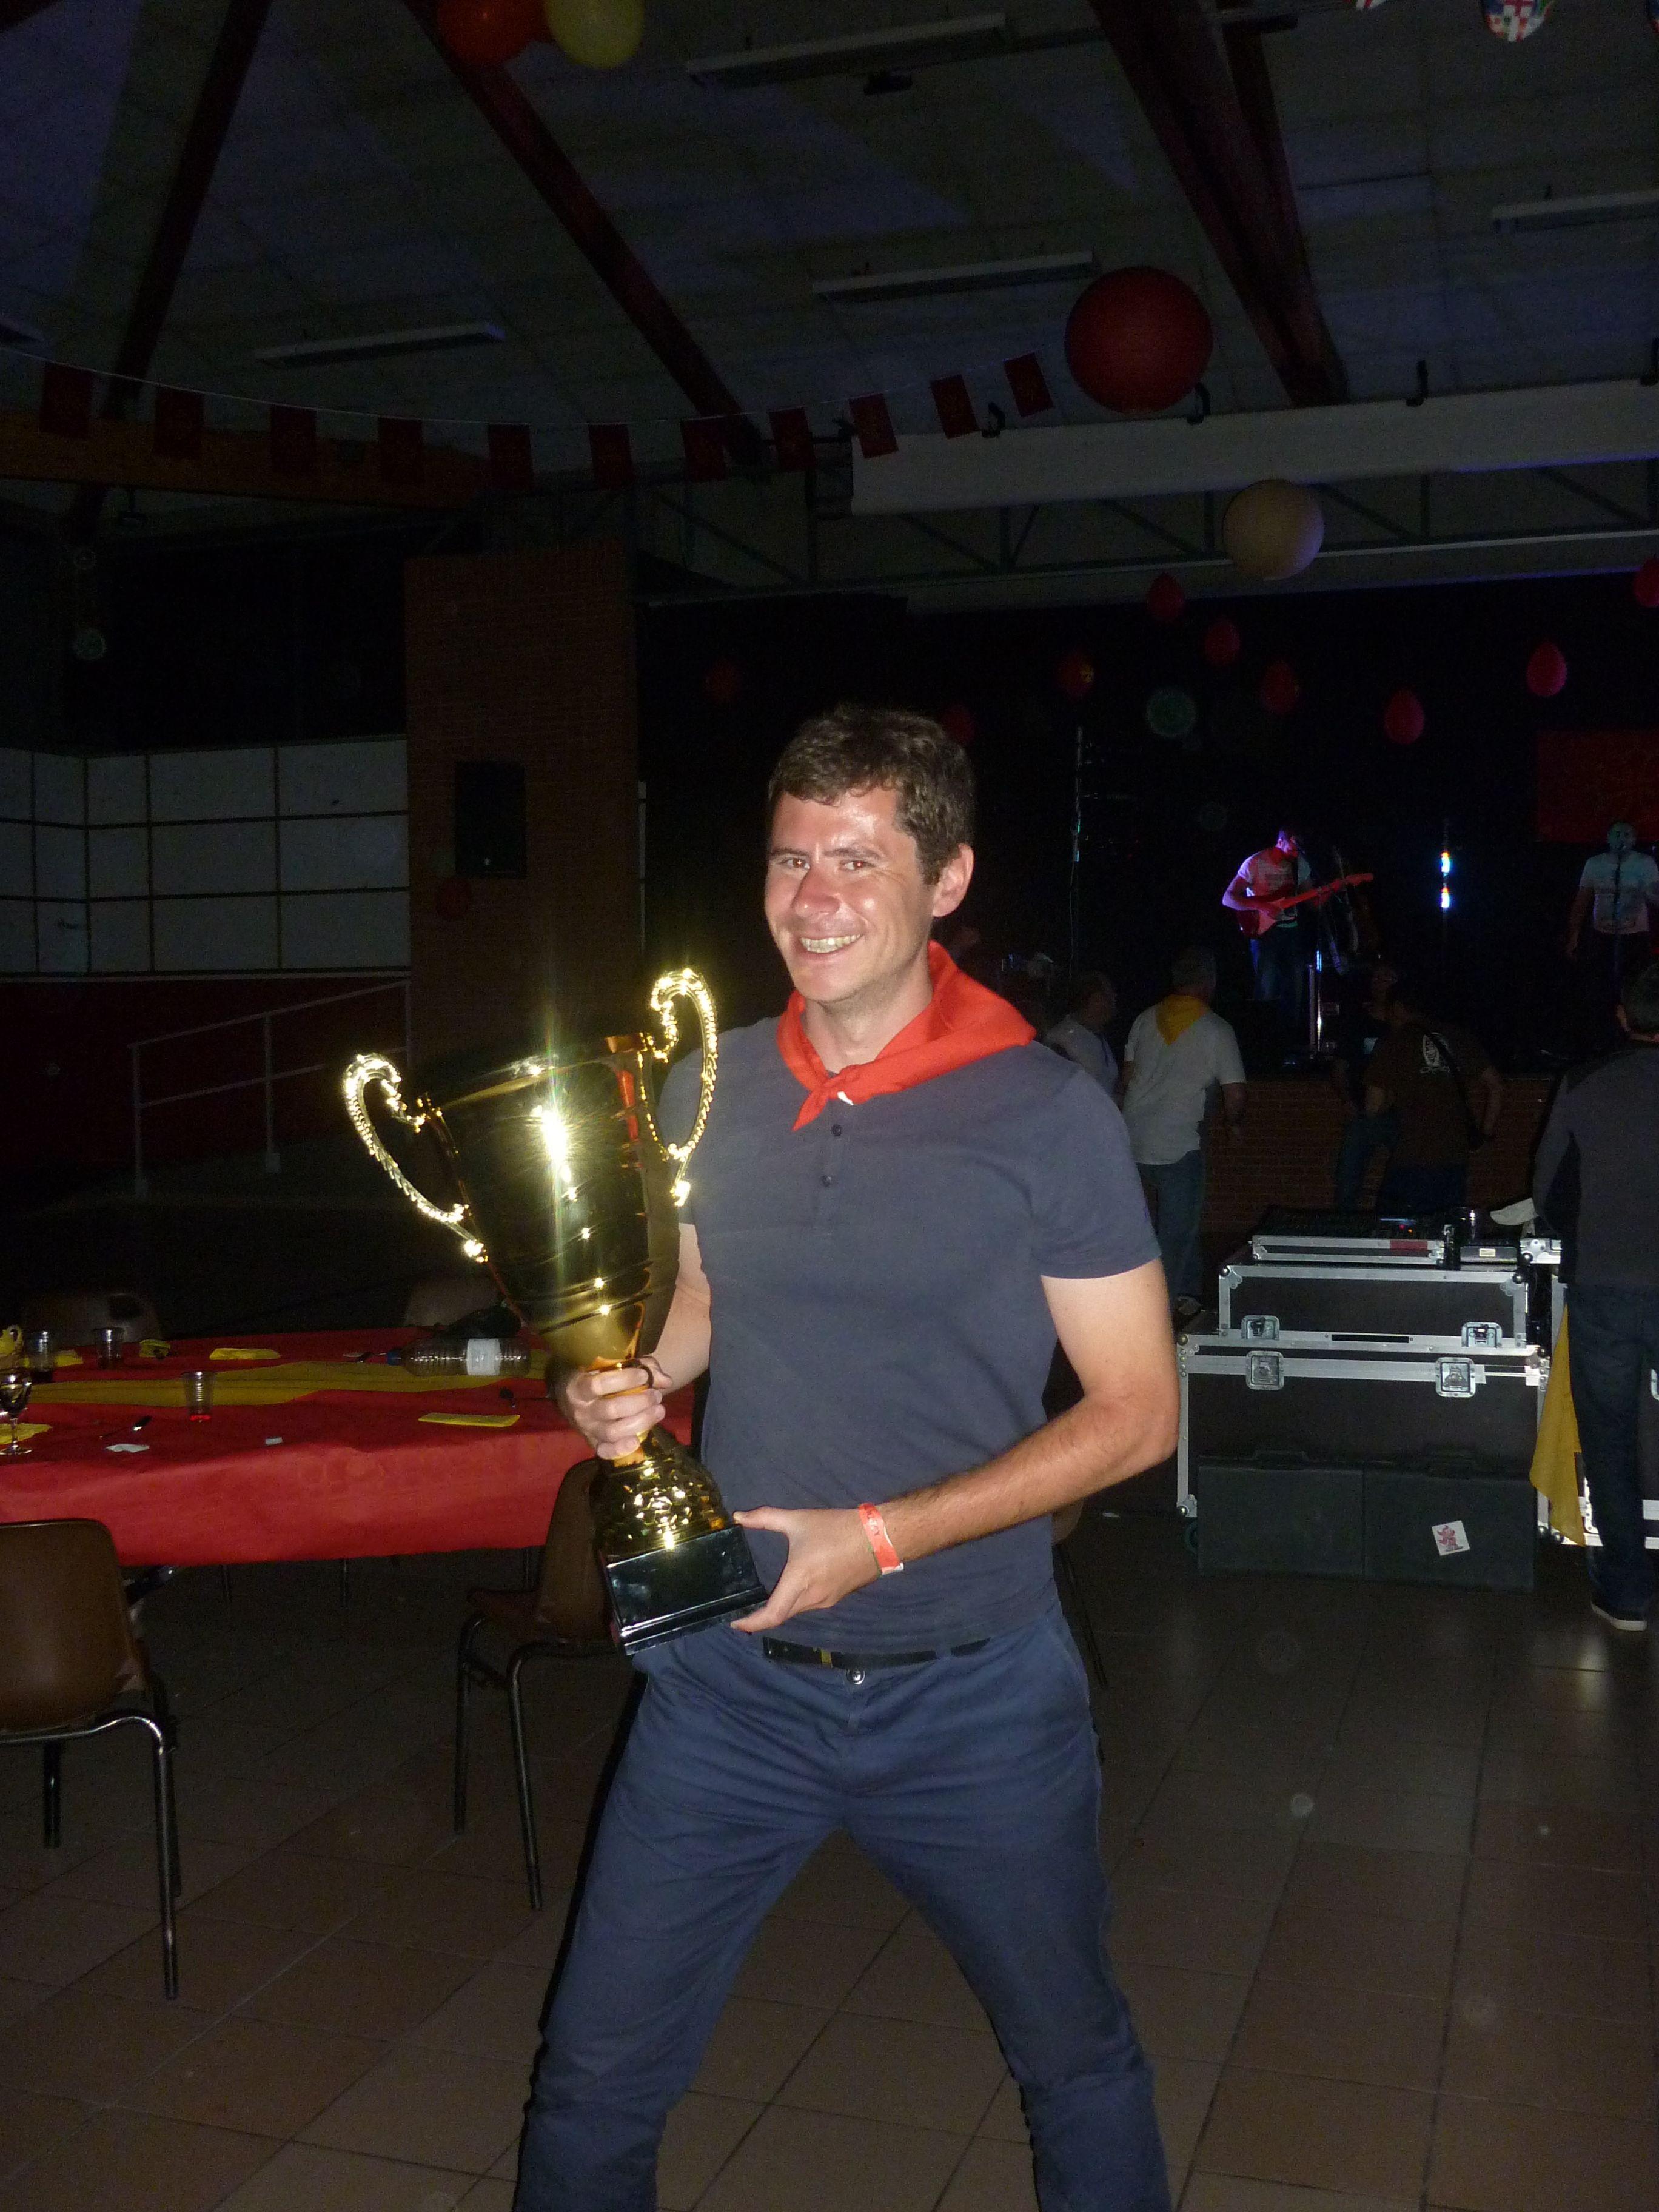 Paris Tag Rugby Club - Tournoi de Fronton 2016